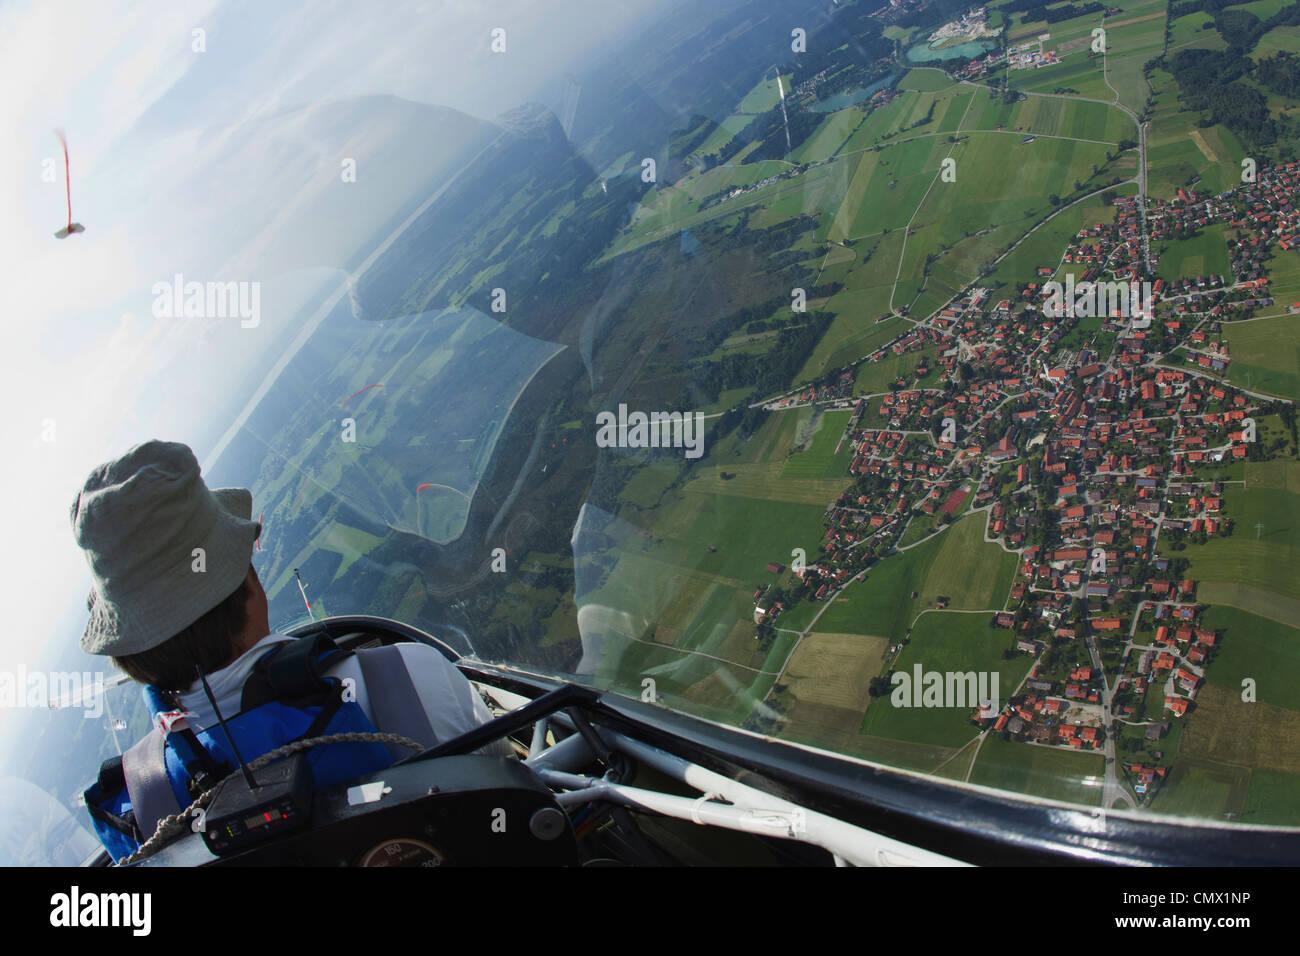 Germany, Bavaria, Bad Toelz, Mature man in glider - Stock Image